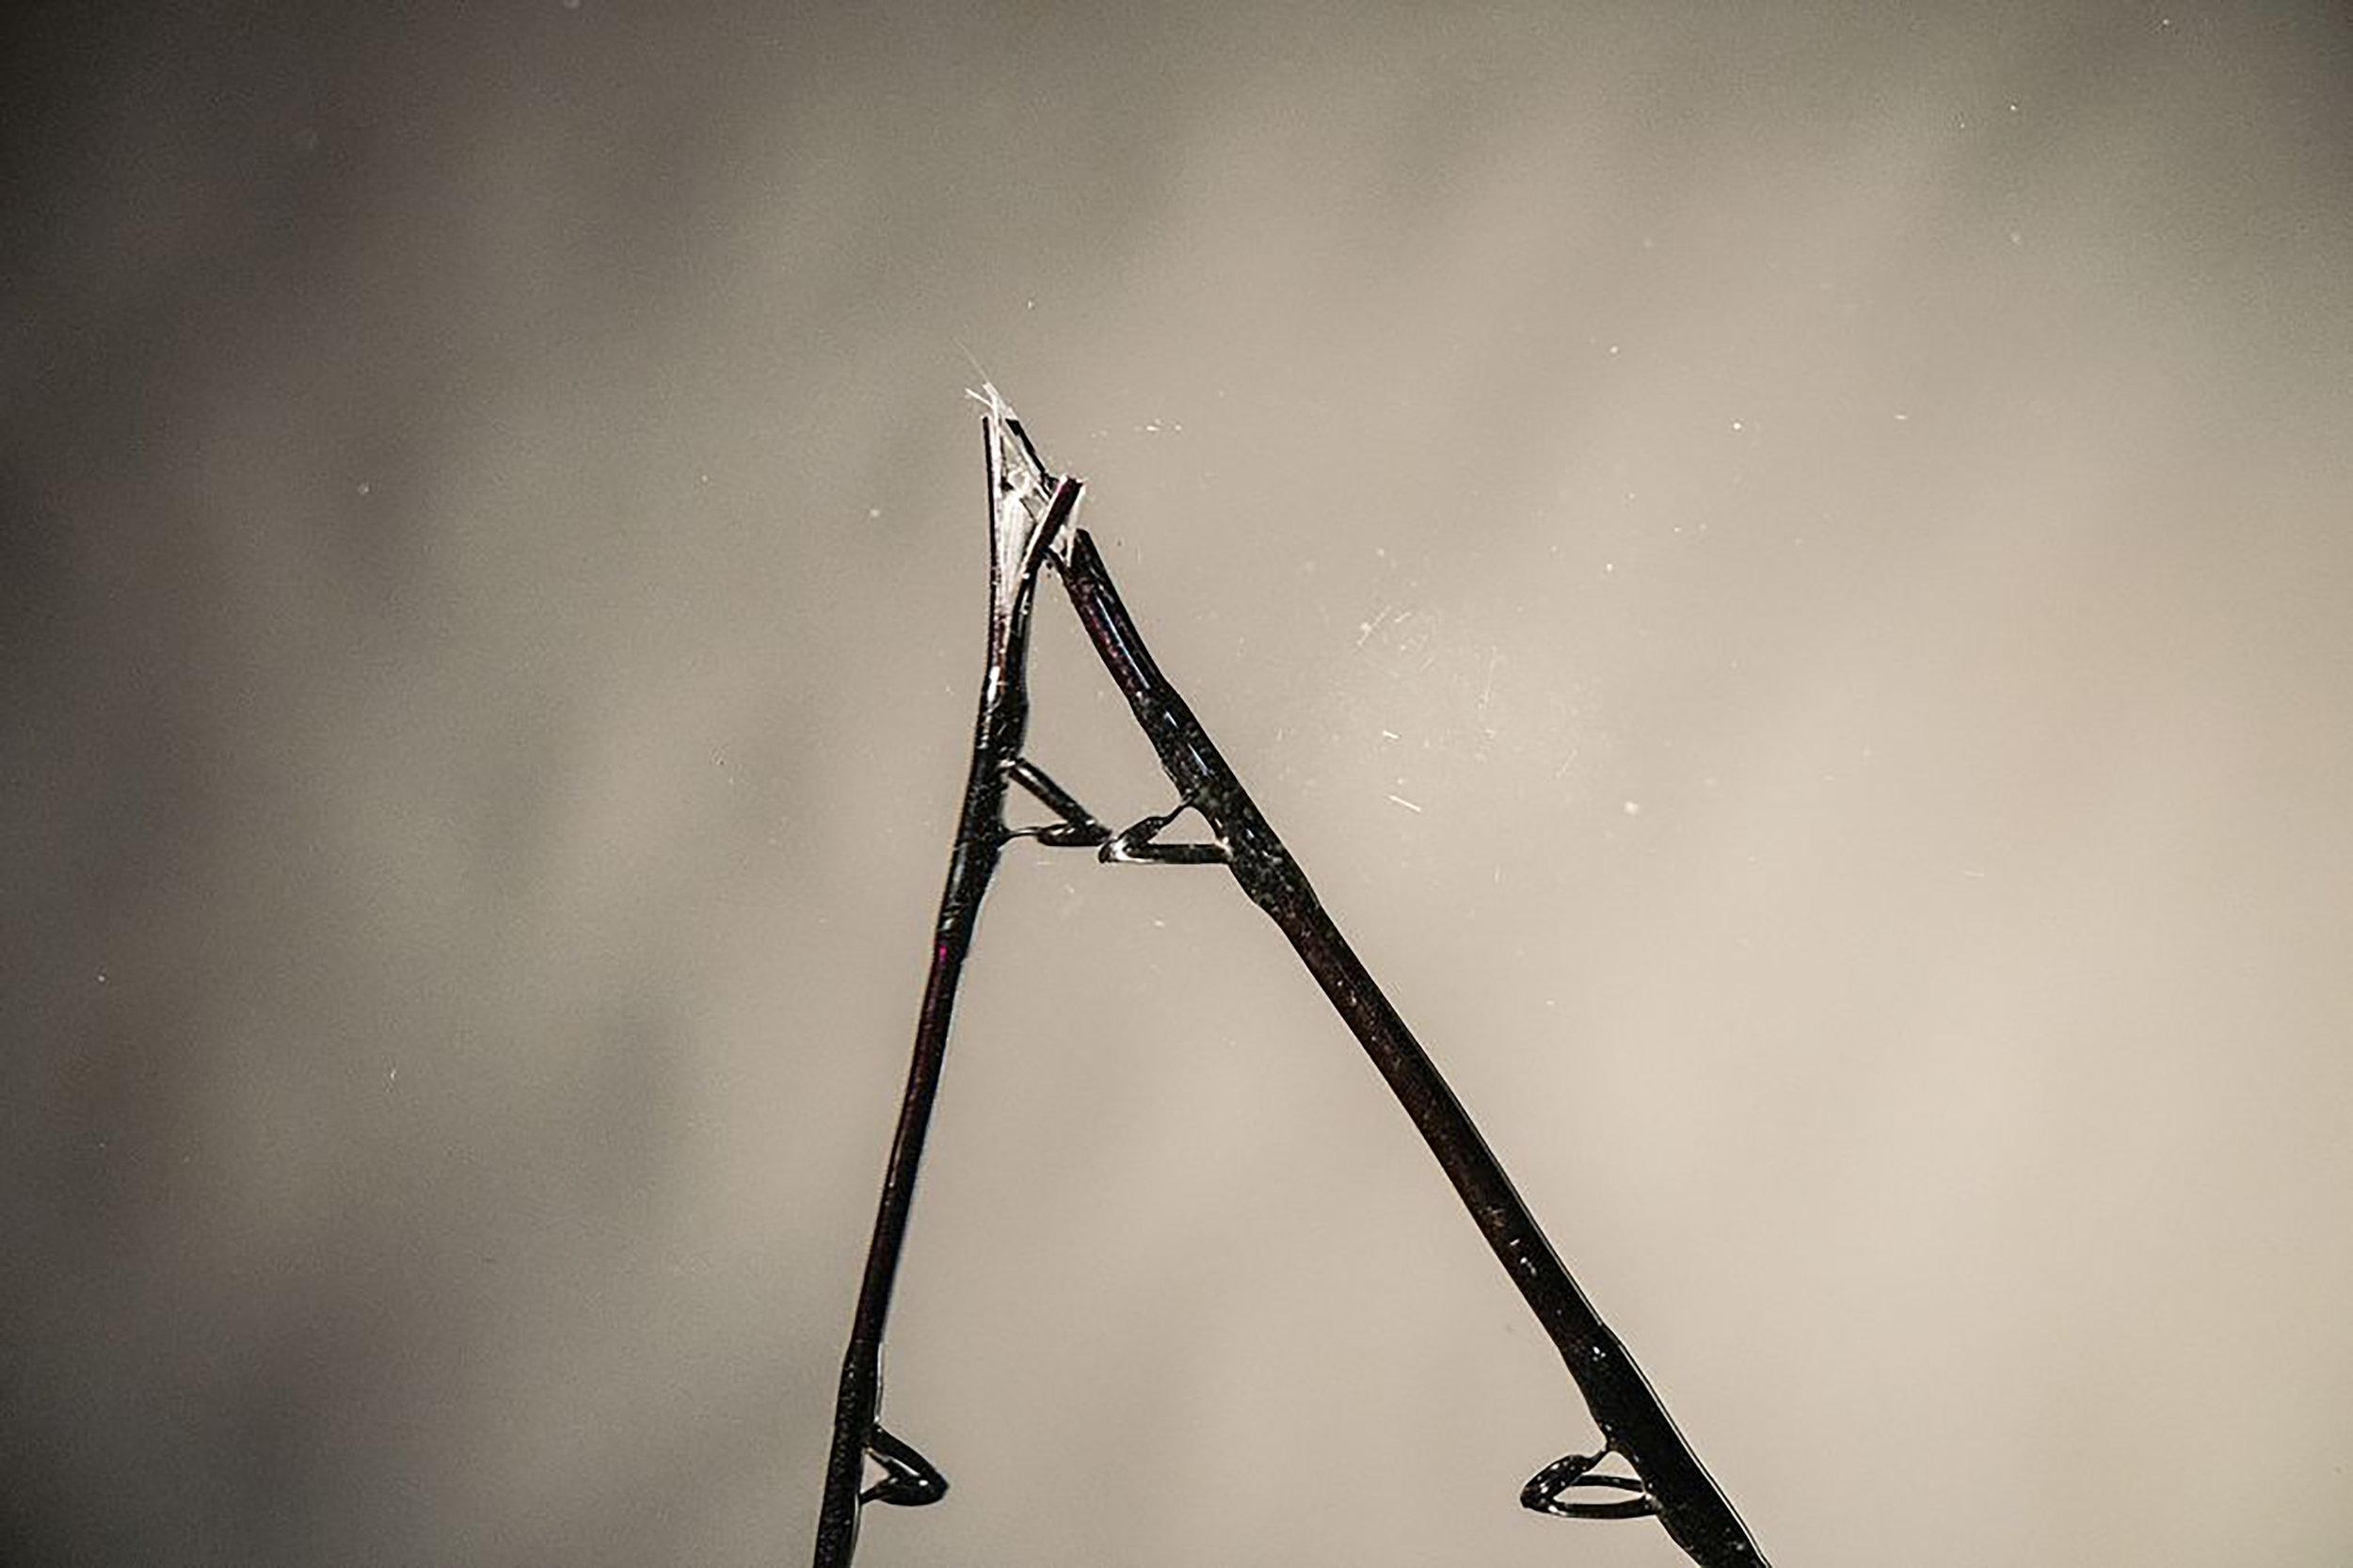 A rod shattered under pressure.  Jon Whittle / Sport Fishing